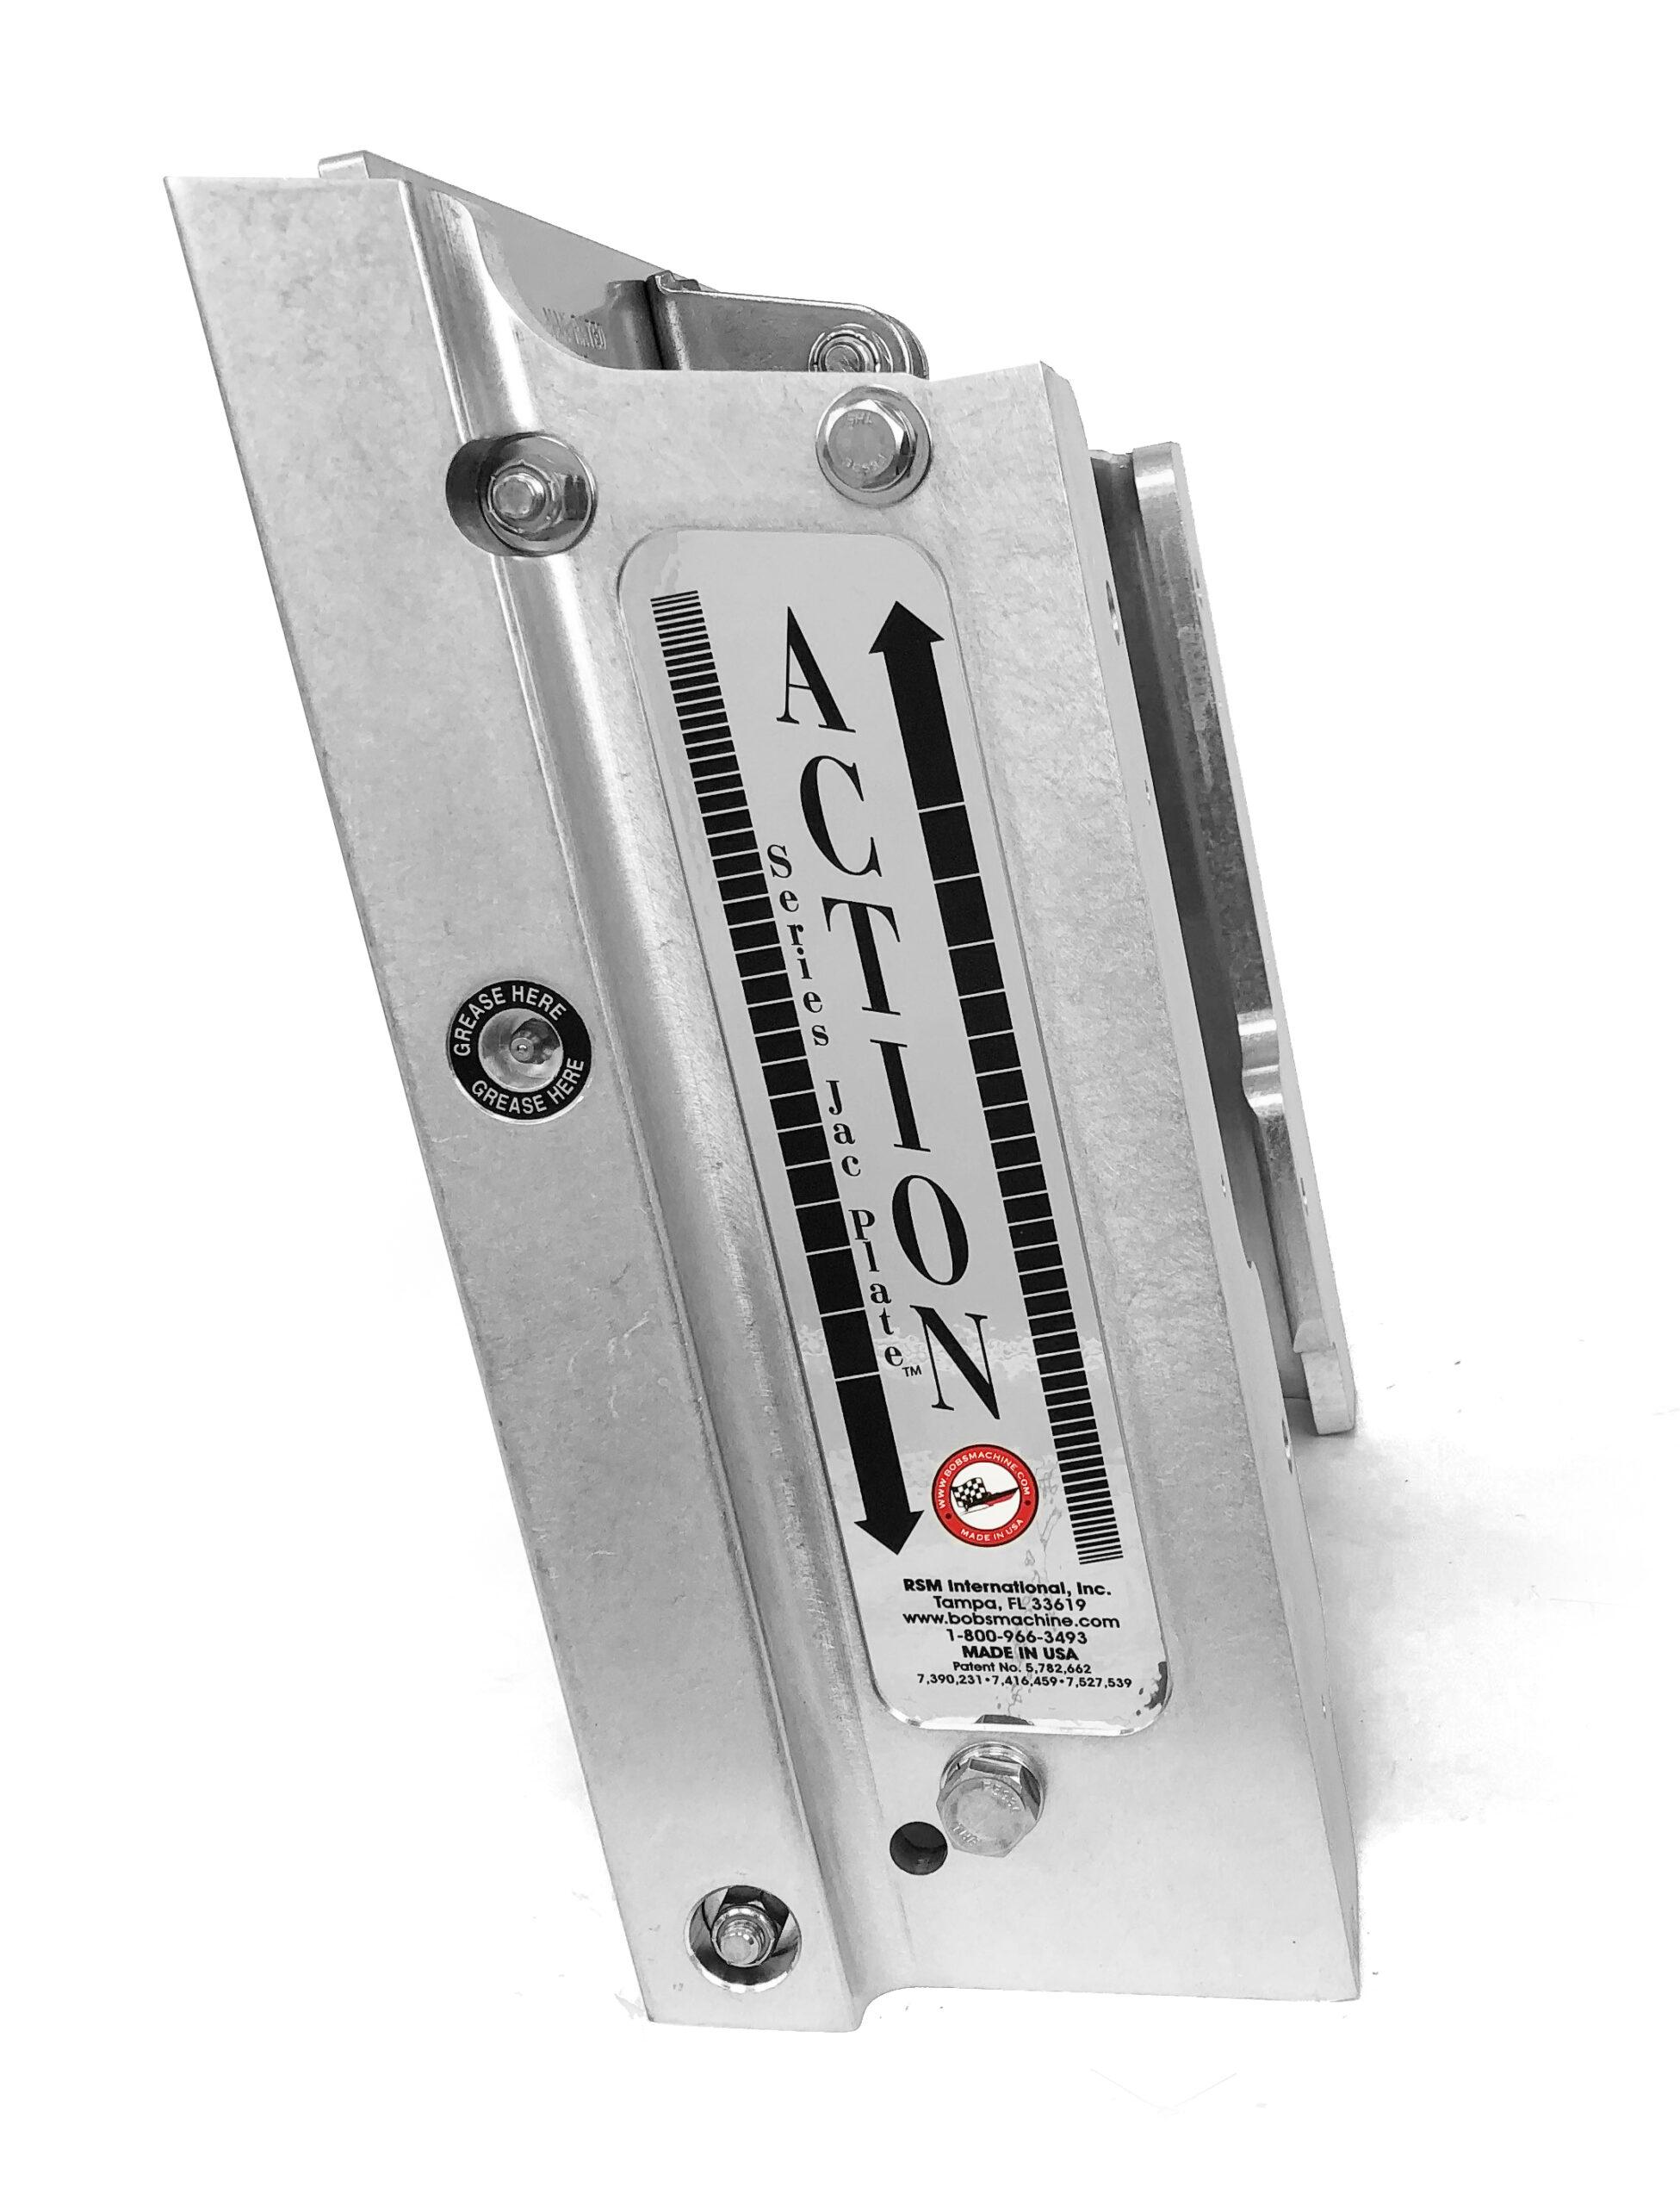 300 HP Max Bobs Machine 100-106010 Action Series Jac Plate-6